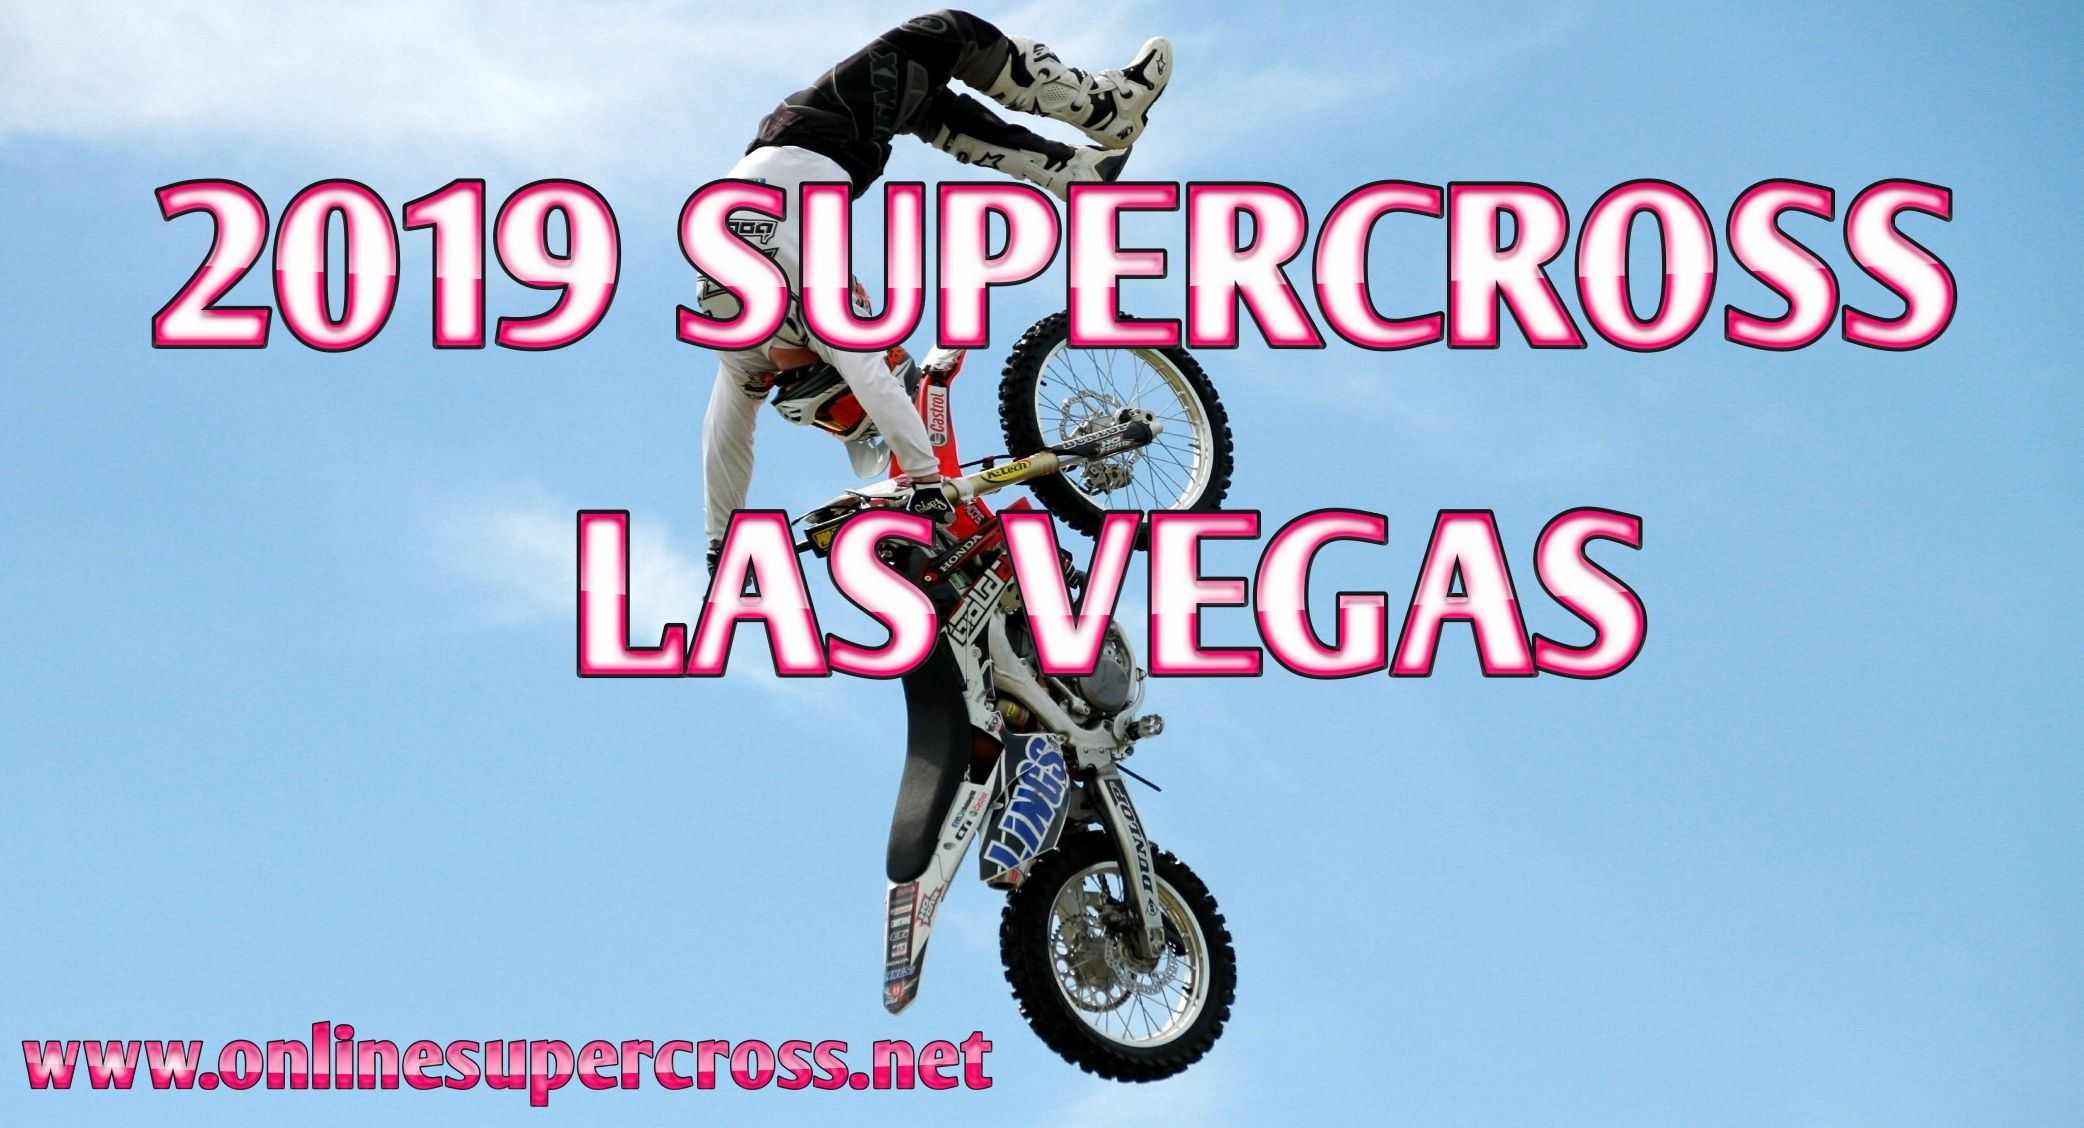 Lasvegas Final Round 2019 Live Streaming Supercross Las Vegas